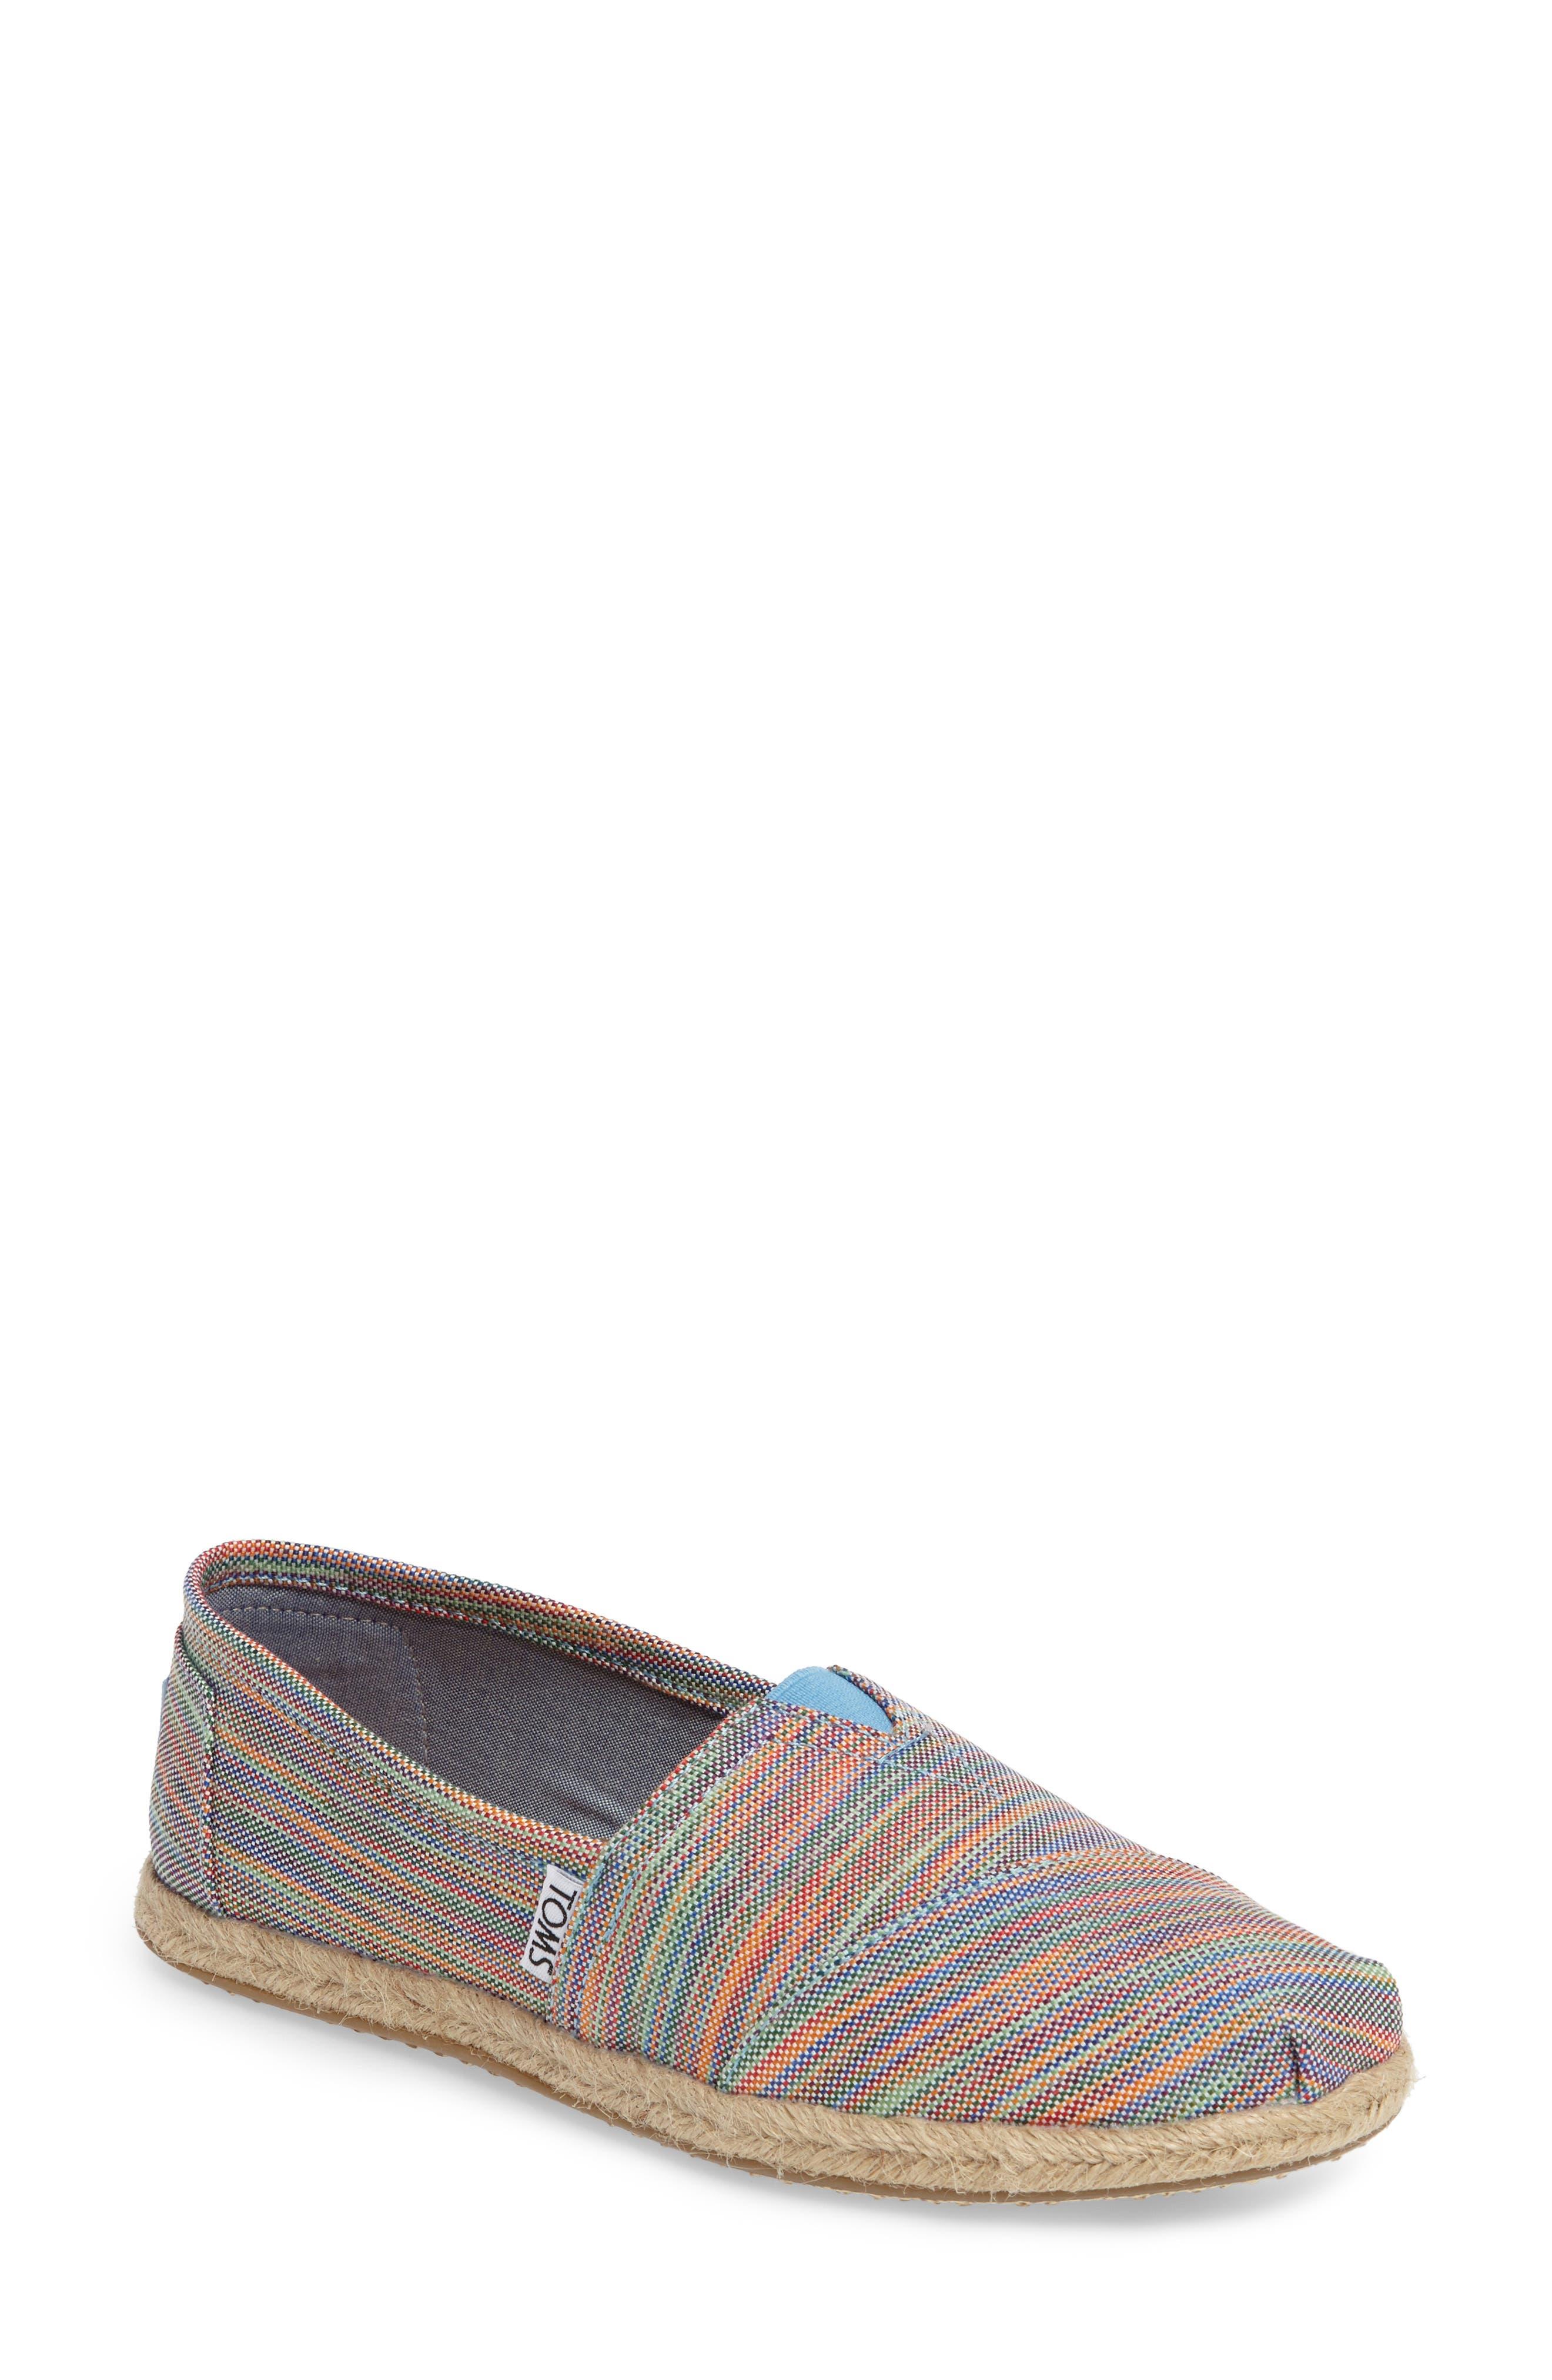 Alpargata Slip-On,                         Main,                         color, 400